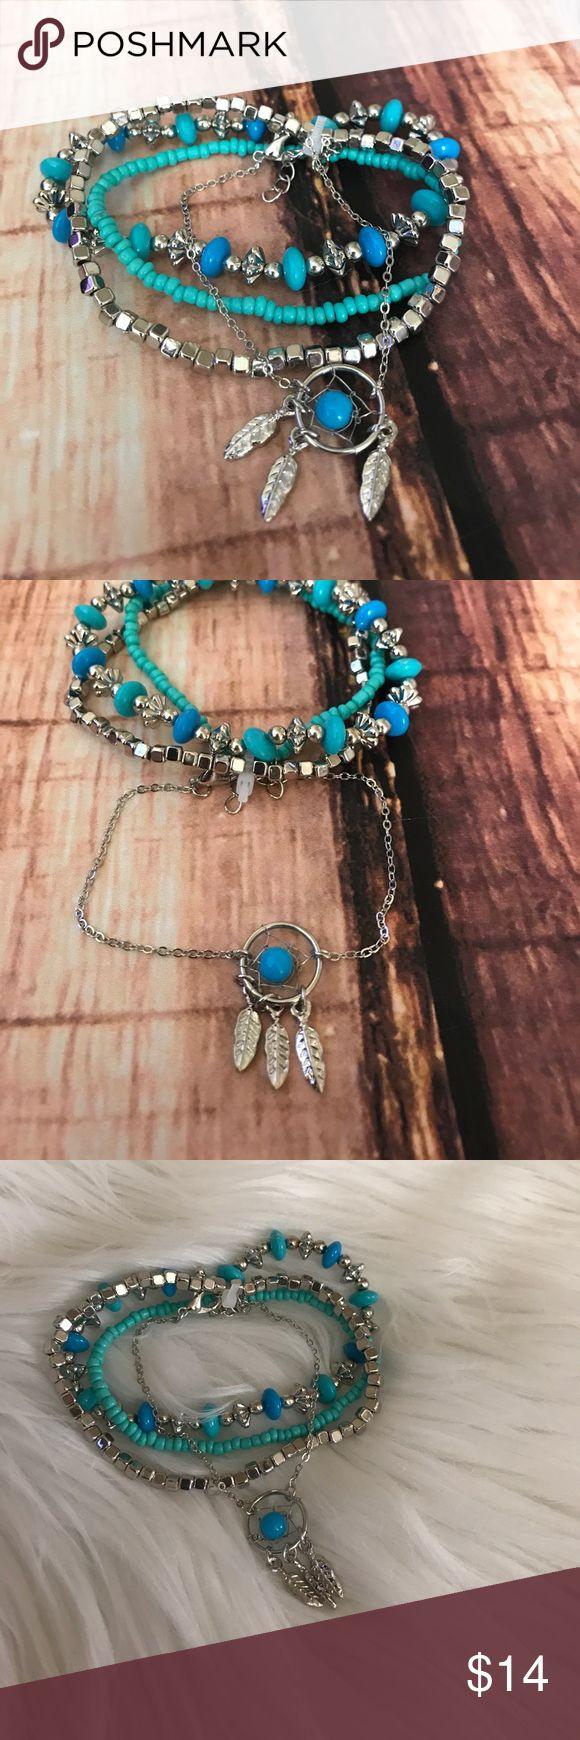 << Dreamcatcher Bracelet Bundle >> 4 bracelet bundle! These beautiful bracelets complement each other so well! 3 bracelets are stretchy, and the dream catcher bracelet has adjustable clasp closure Boutique Jewelry Bracelets